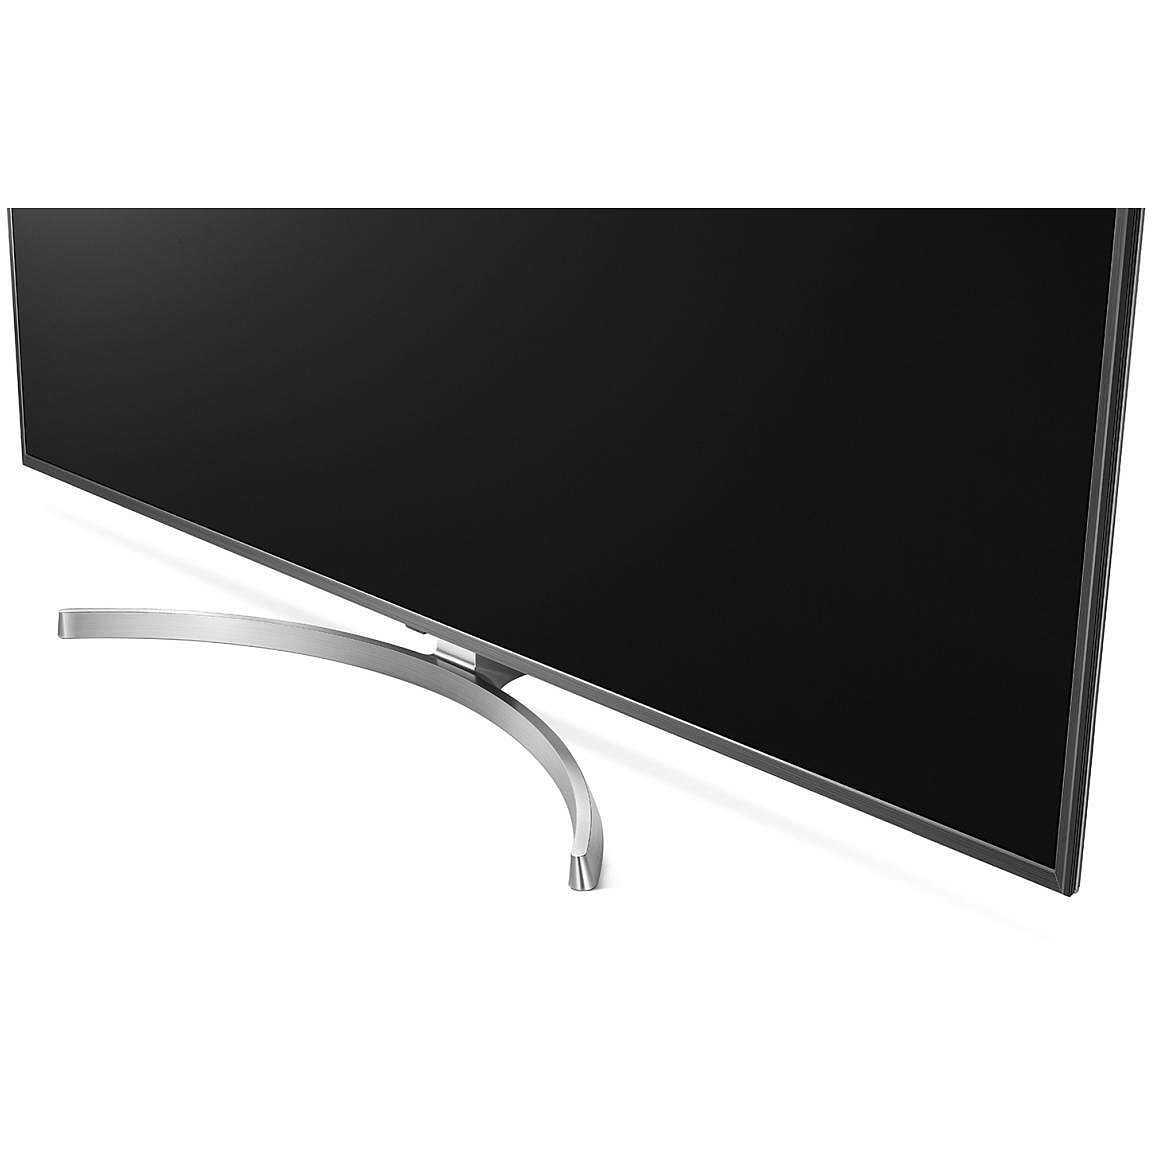 Coprifili Tv Arredamento.Lg 49sk8100 Tv 49 Super Ultra Hd Nanocell 4k Hdr Smart Tv